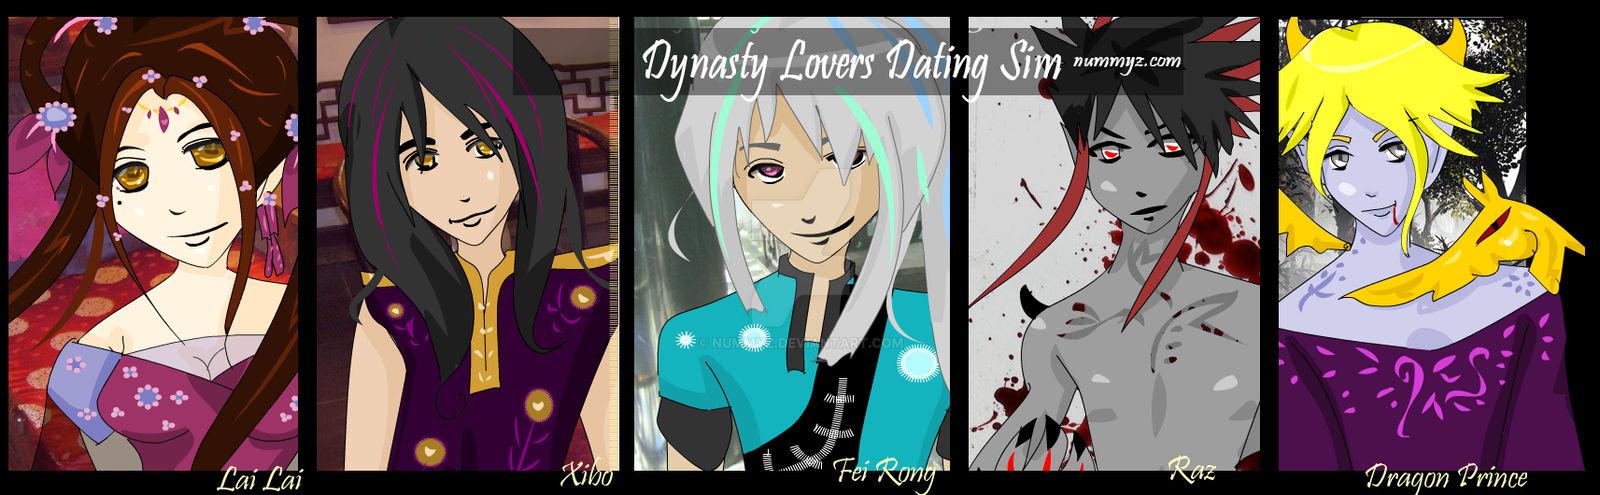 DYNASTY LOVERS Dating Sim RPG